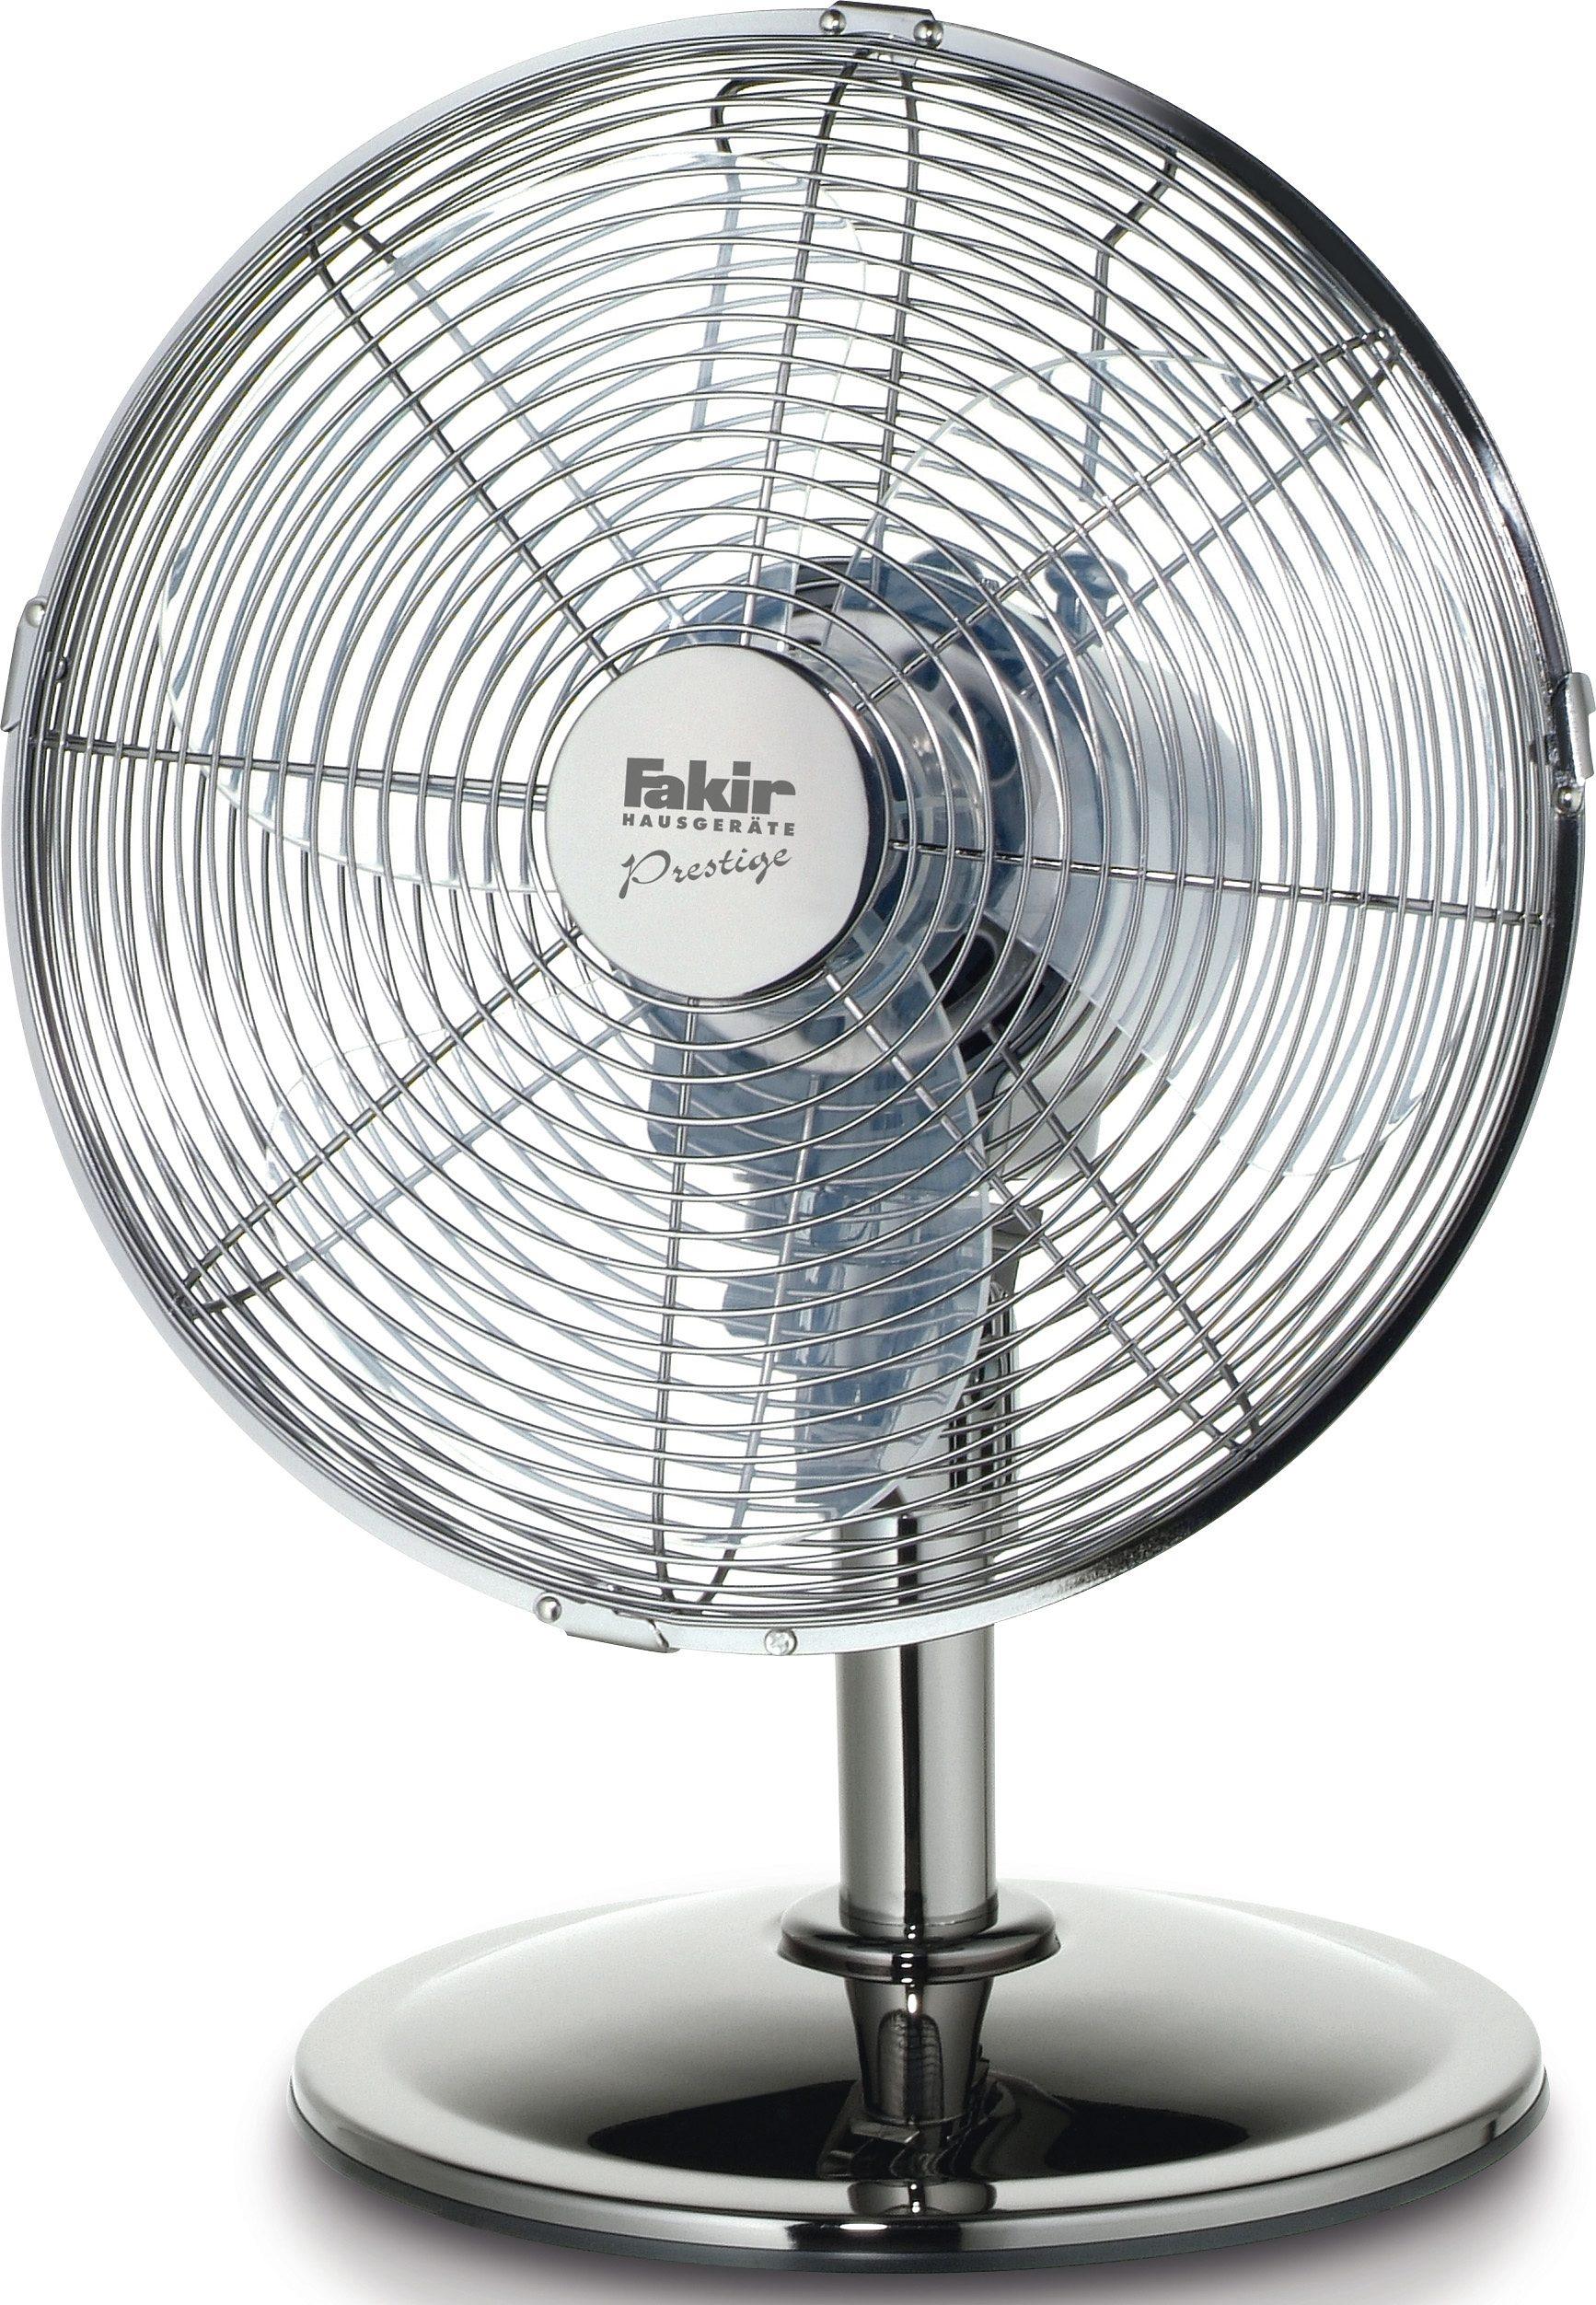 Fakir Tisch-Ventilator VL 30 G